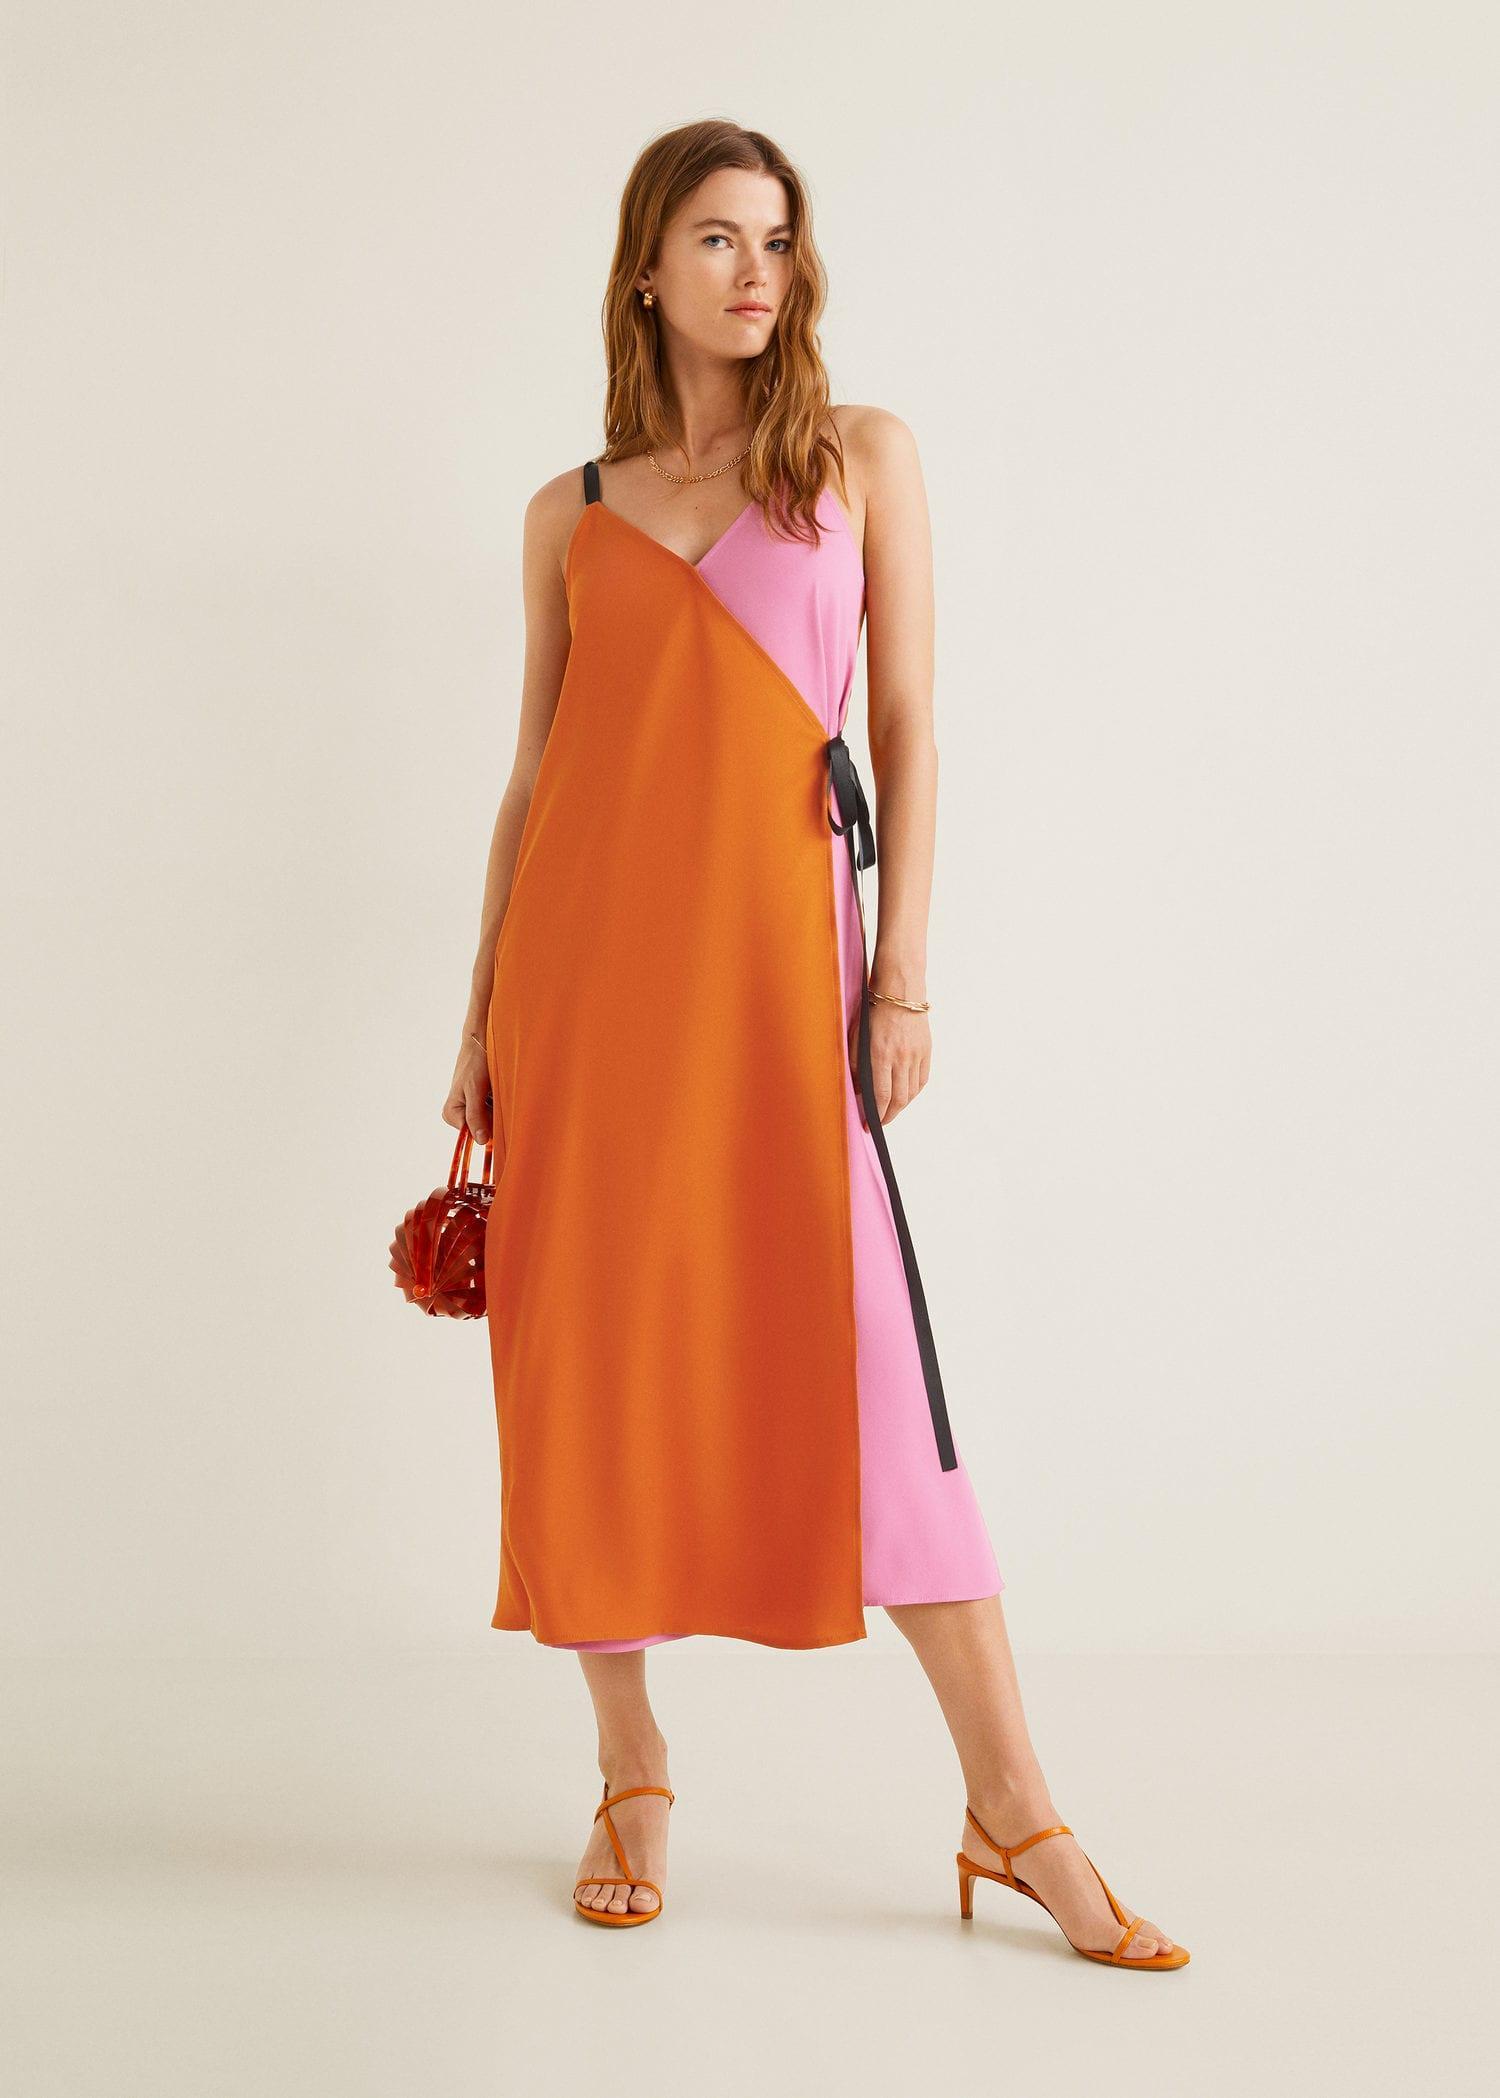 6eaab8b2b80 Mango - Orange Bow Bicolor Dress - Lyst. View fullscreen